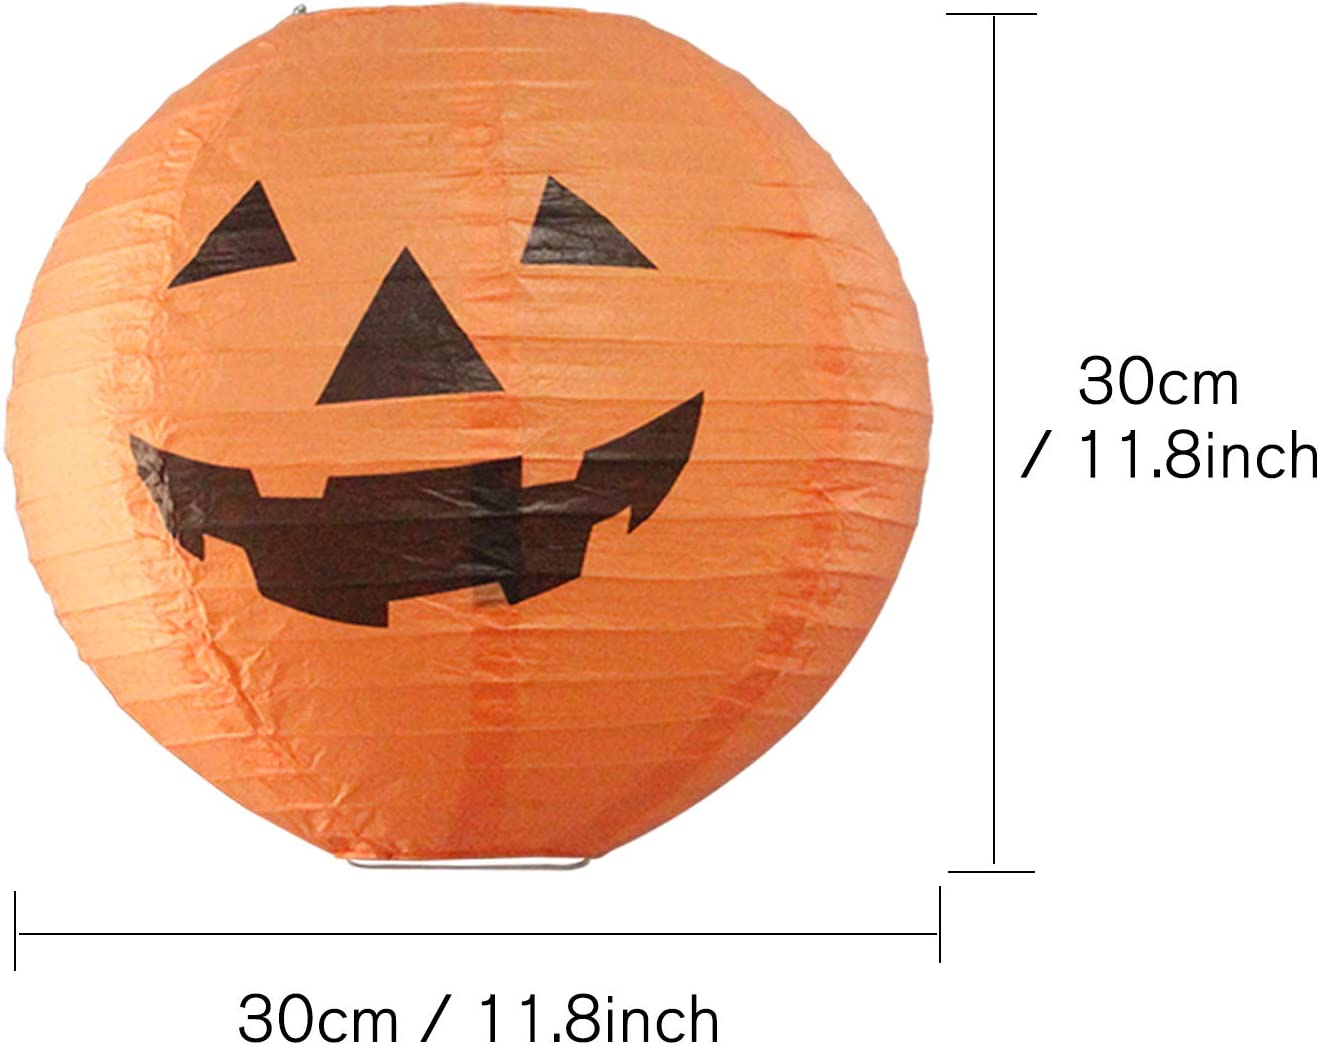 4 Pieces Halloween Pumpkin Hats Jack-O-Lantern Hats Orange Pumpkin Caps for Halloween Trick-or-Treat Birthday Party Favors